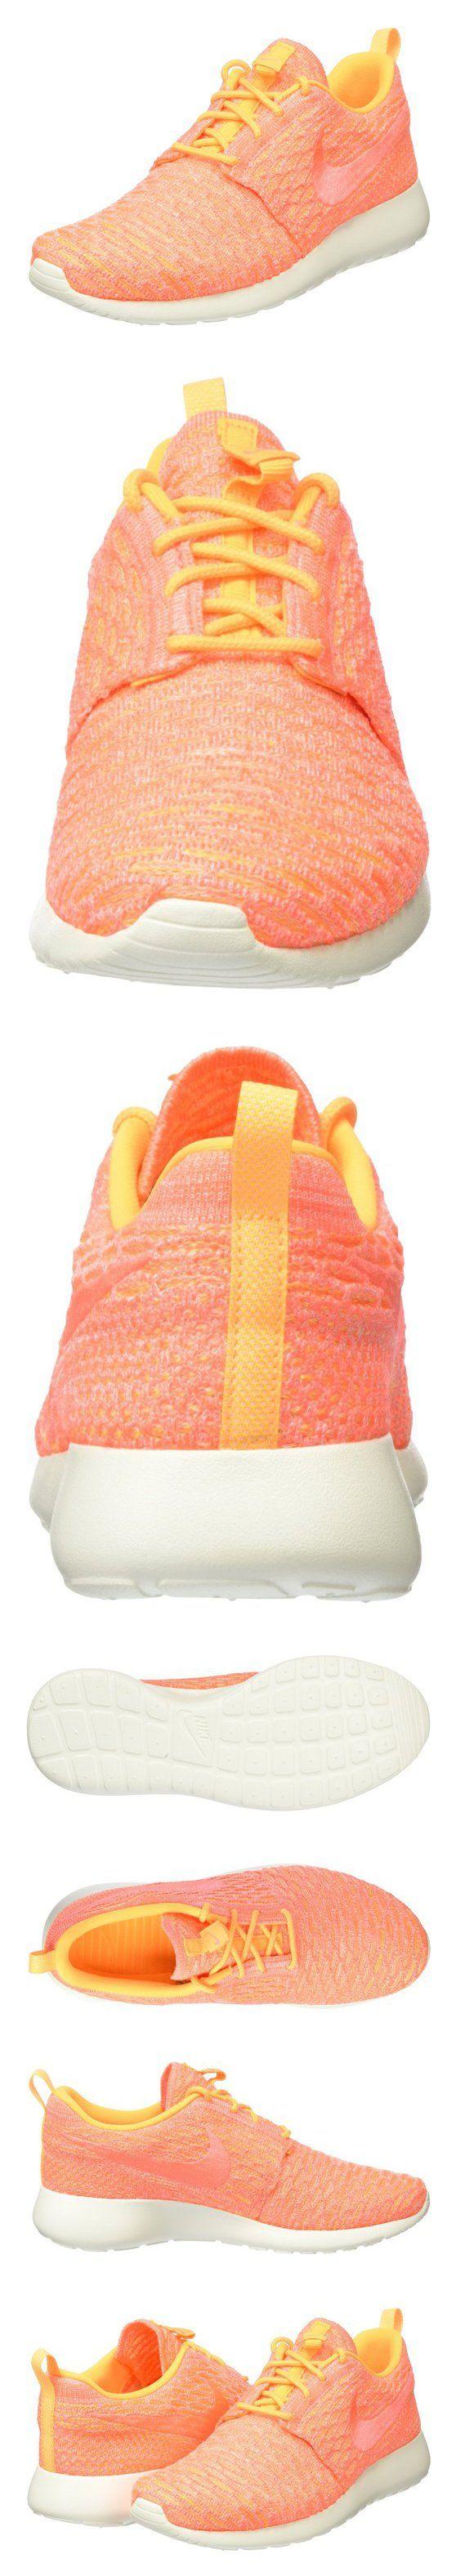 $120 - Nike Women's Roshe One Flyknit Laser Orange/Bright Mango/Sail Running Shoe 7 Women US #shoes #nike #2015